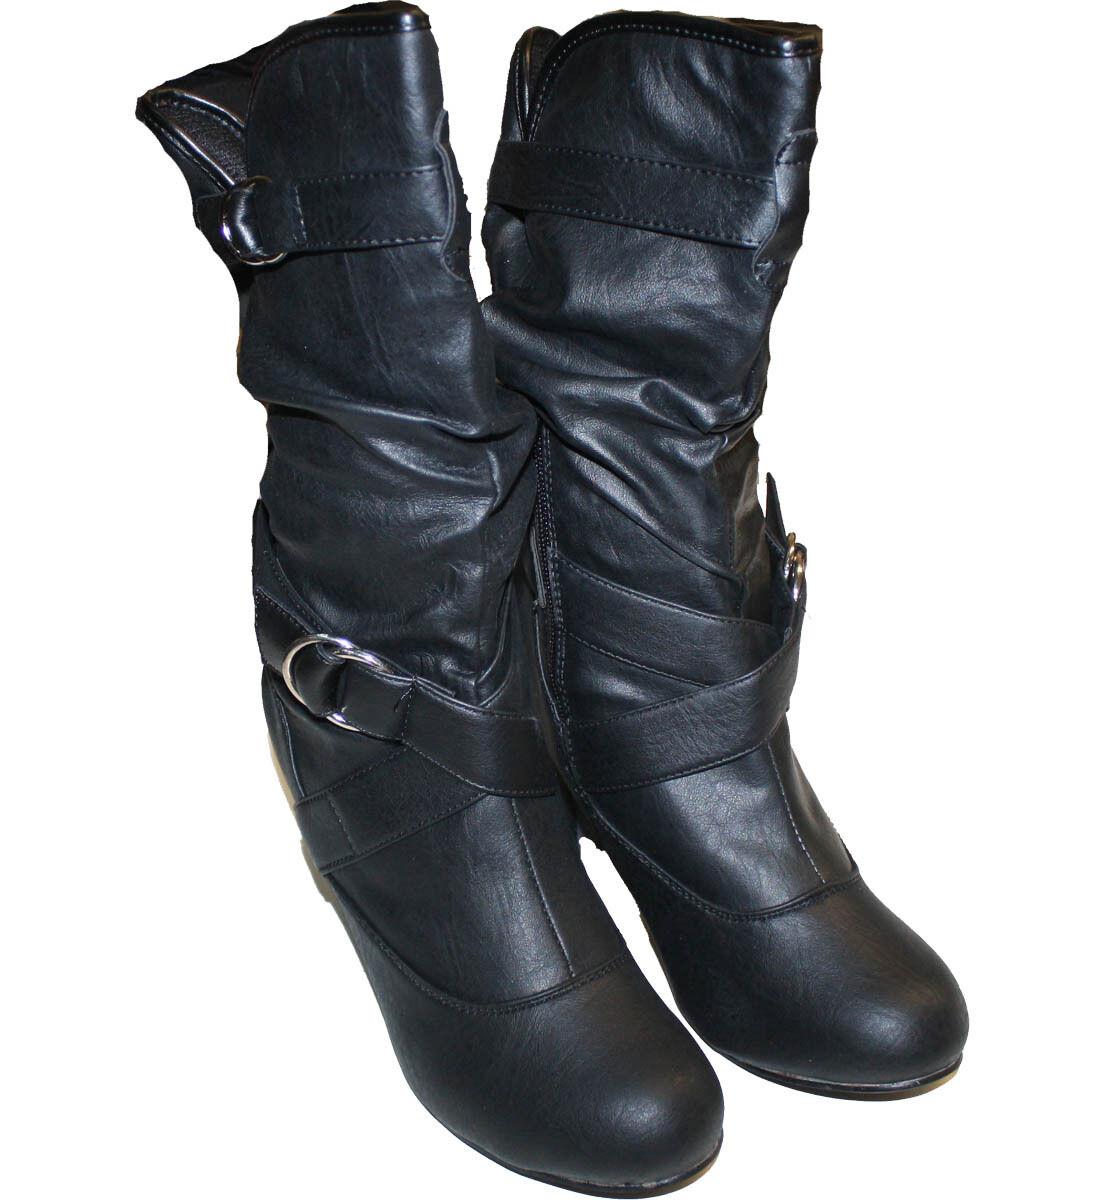 Women's Sexy Round Toe High Heel Manmade Leather Sexy Women's Stylish Shoes Fashion-LOMA High dbc001